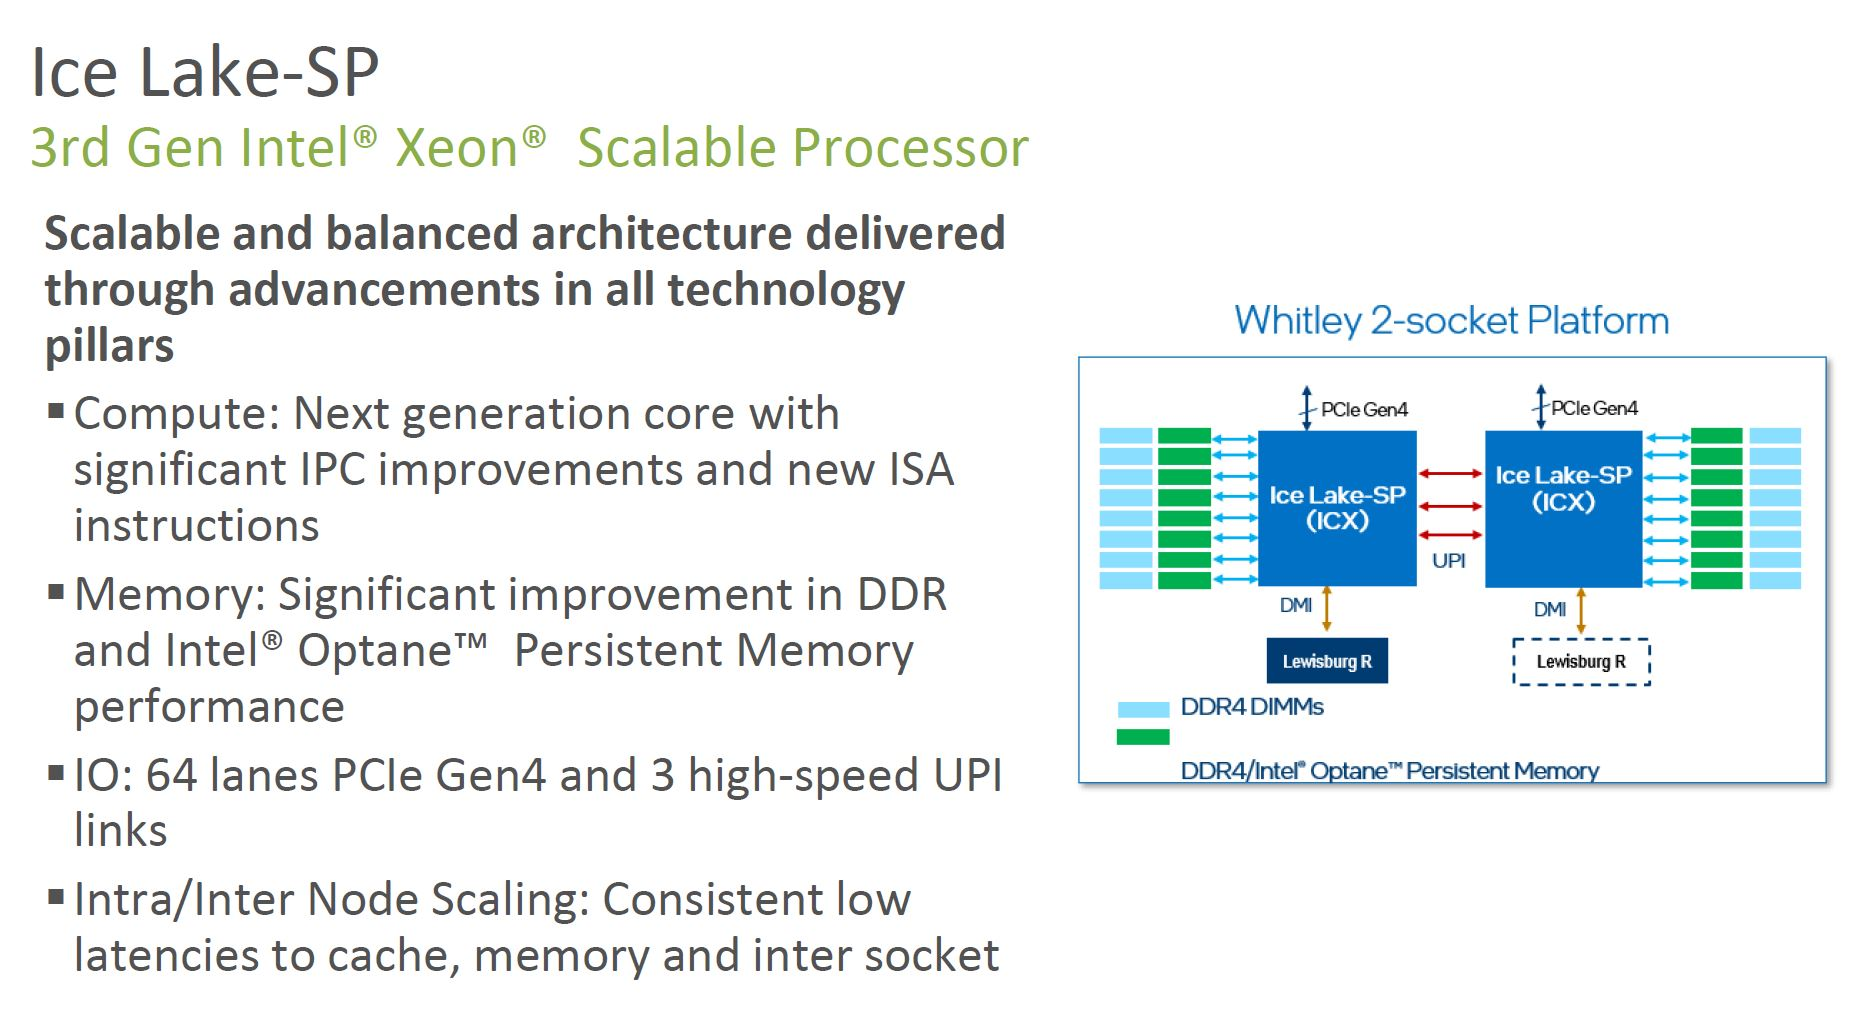 3rd Generation Intel Xeon Scalable Ice Lake 1